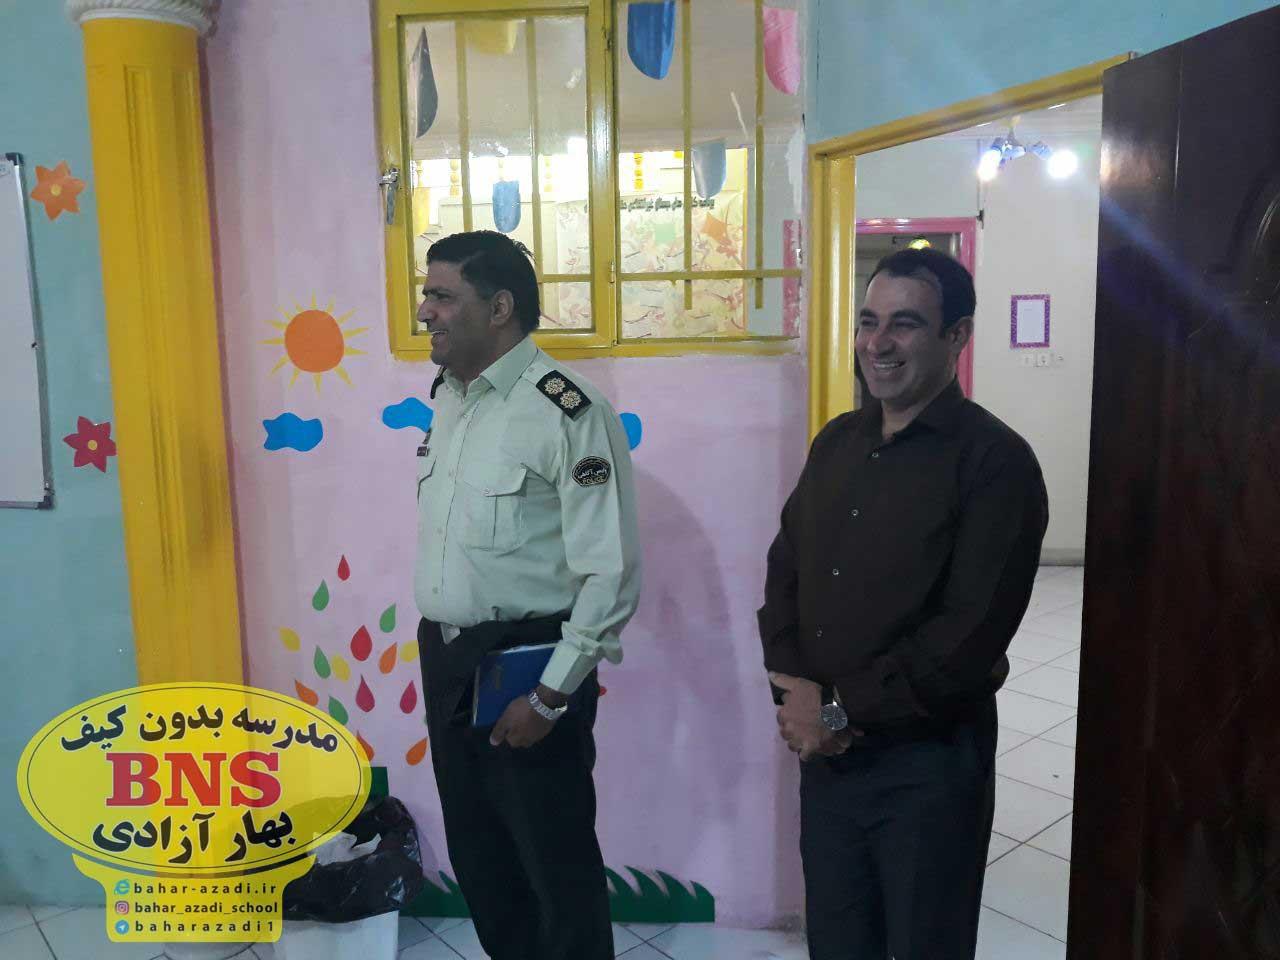 pejman irandoust2 - تصاویری از مدیریت مدرسه بدون کیف مریم آزادی اصفهان و مهندس پژمان ایراندوست